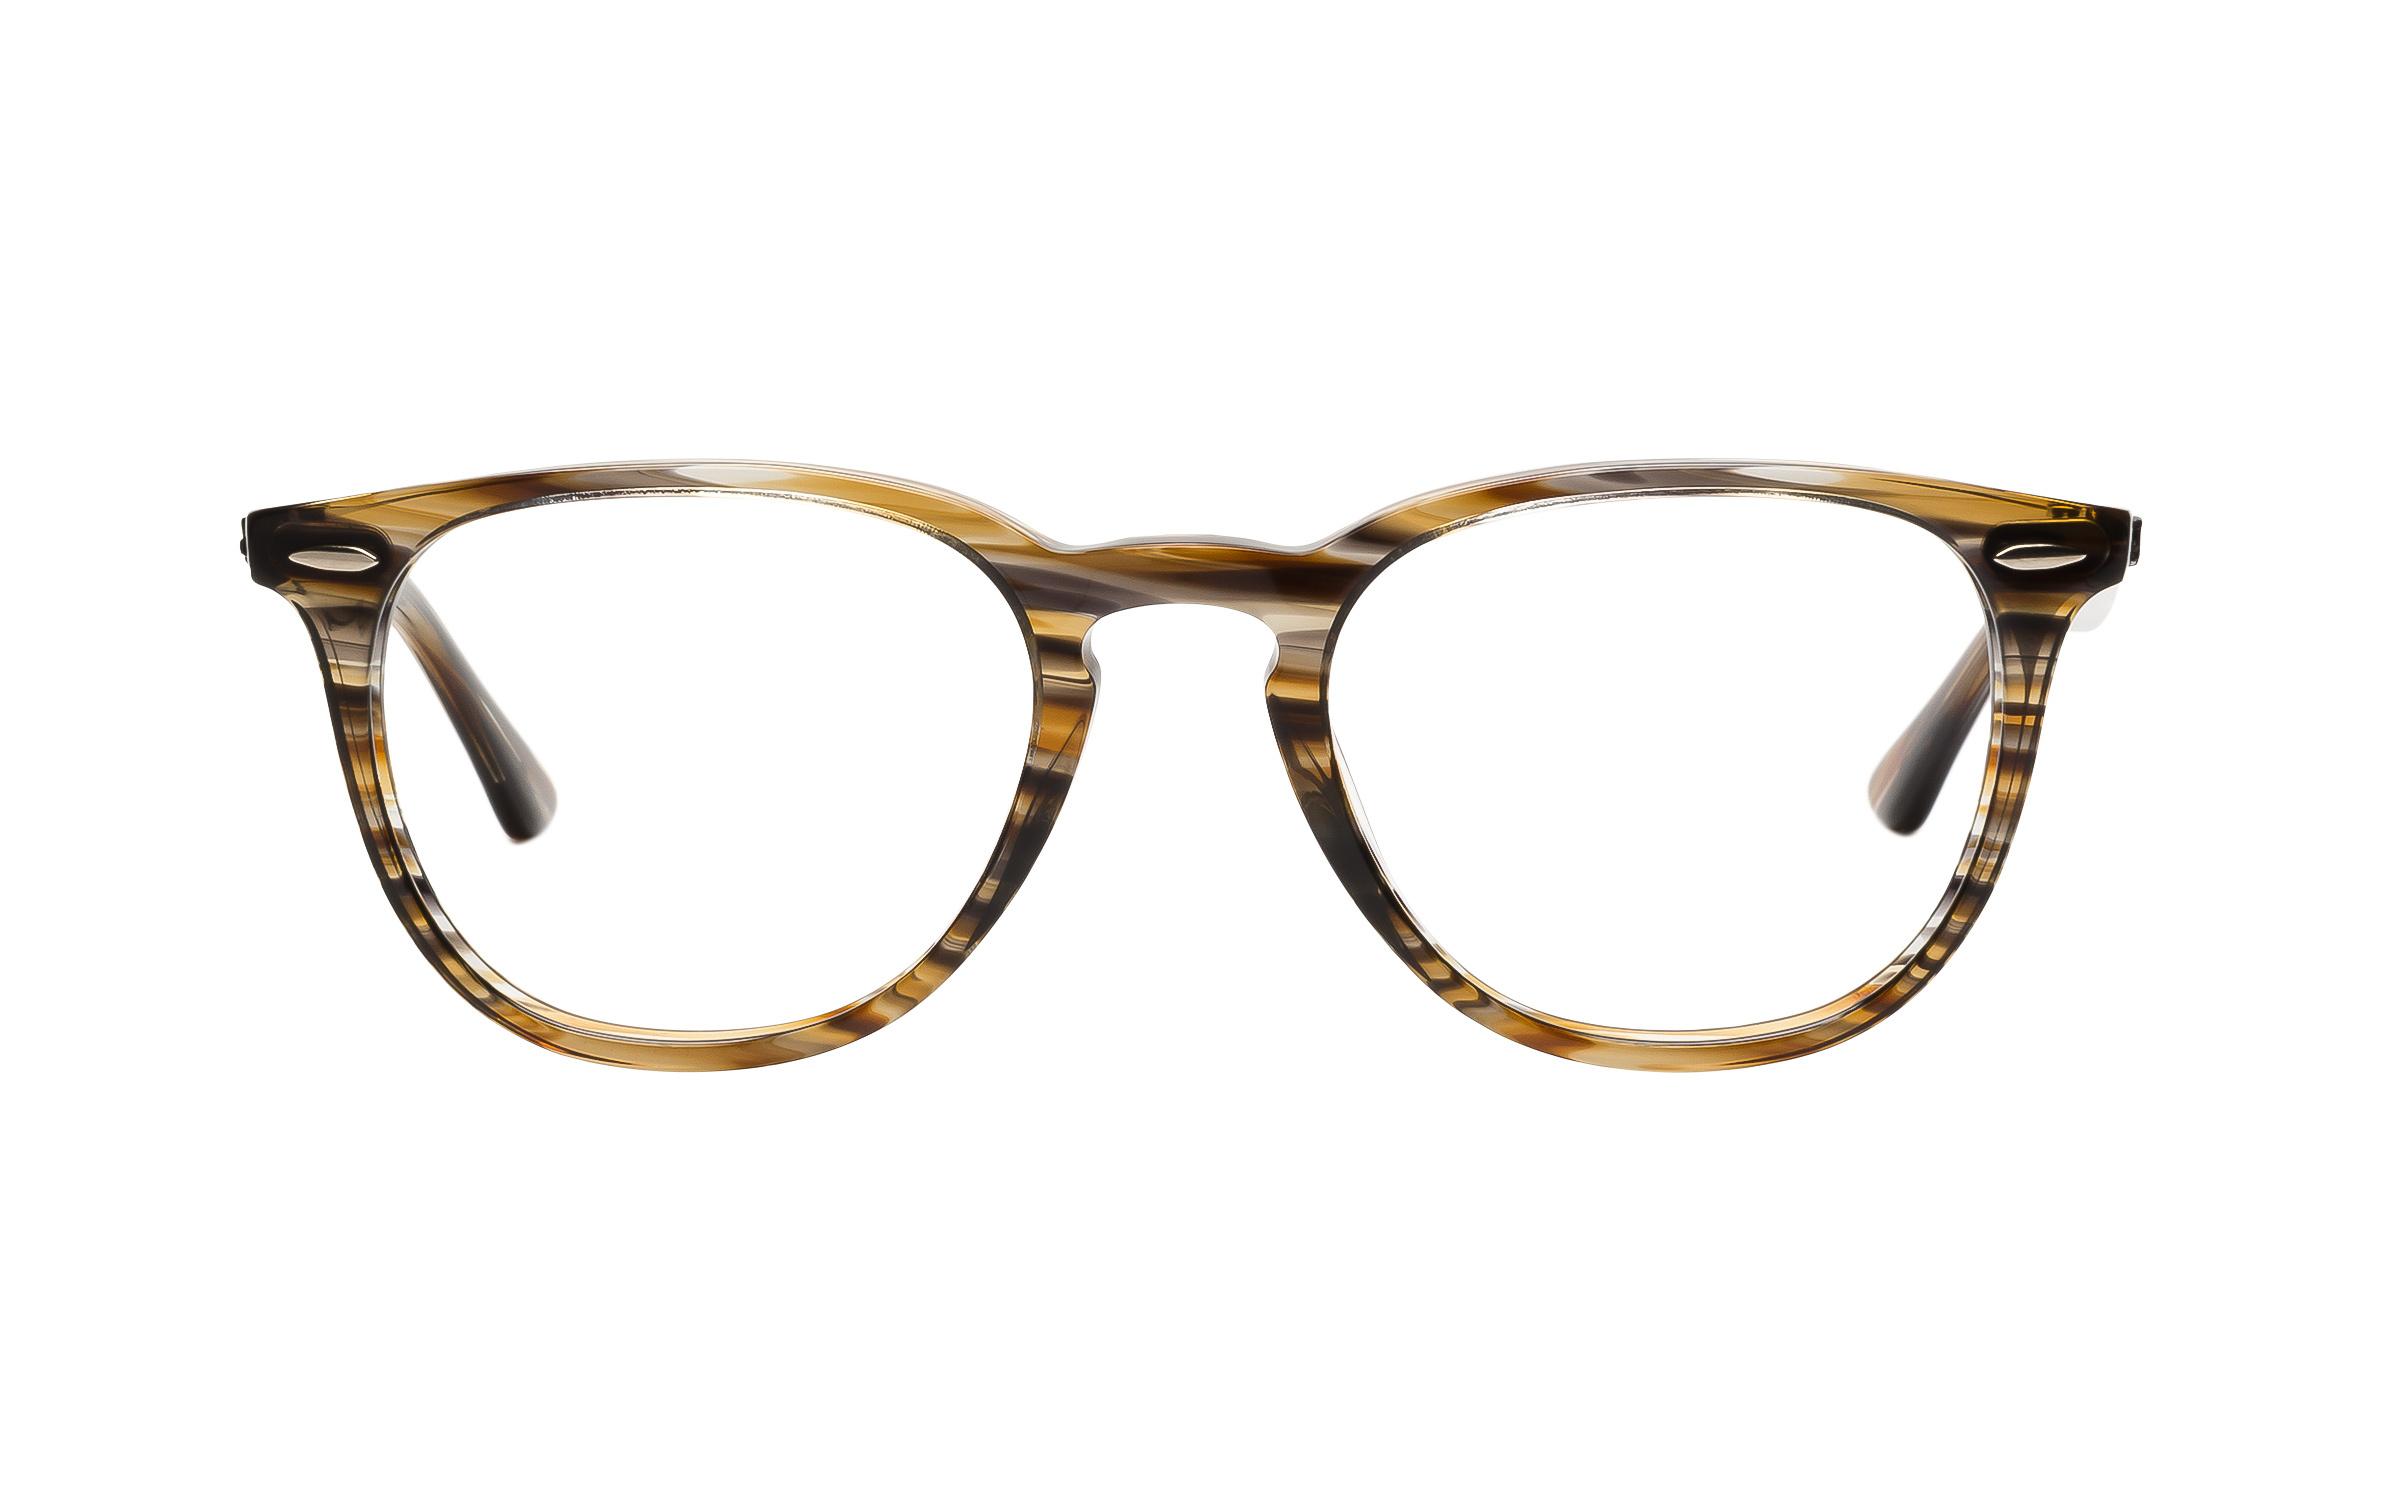 Ray-Ban Glasses Vintage Brown Acetate Online Coastal